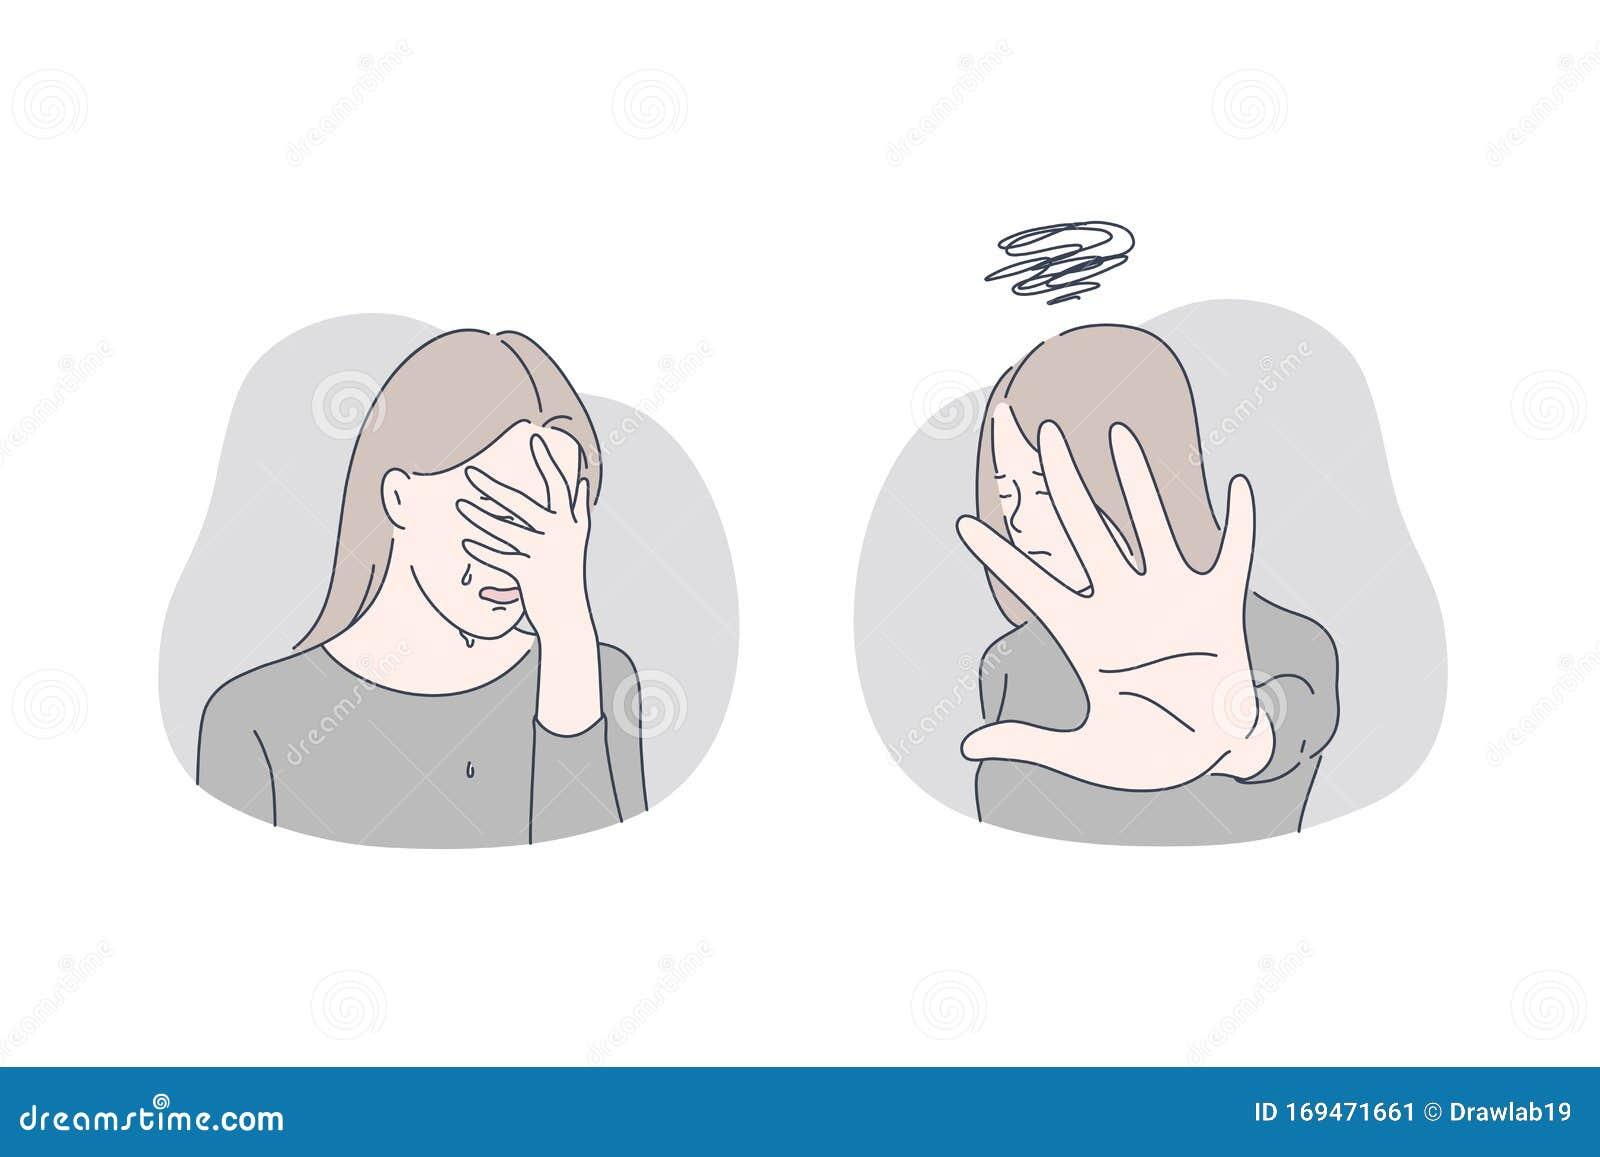 Stress Depression Refusal Set Concept Stock Vector Illustration Of Broken Depression 169471661